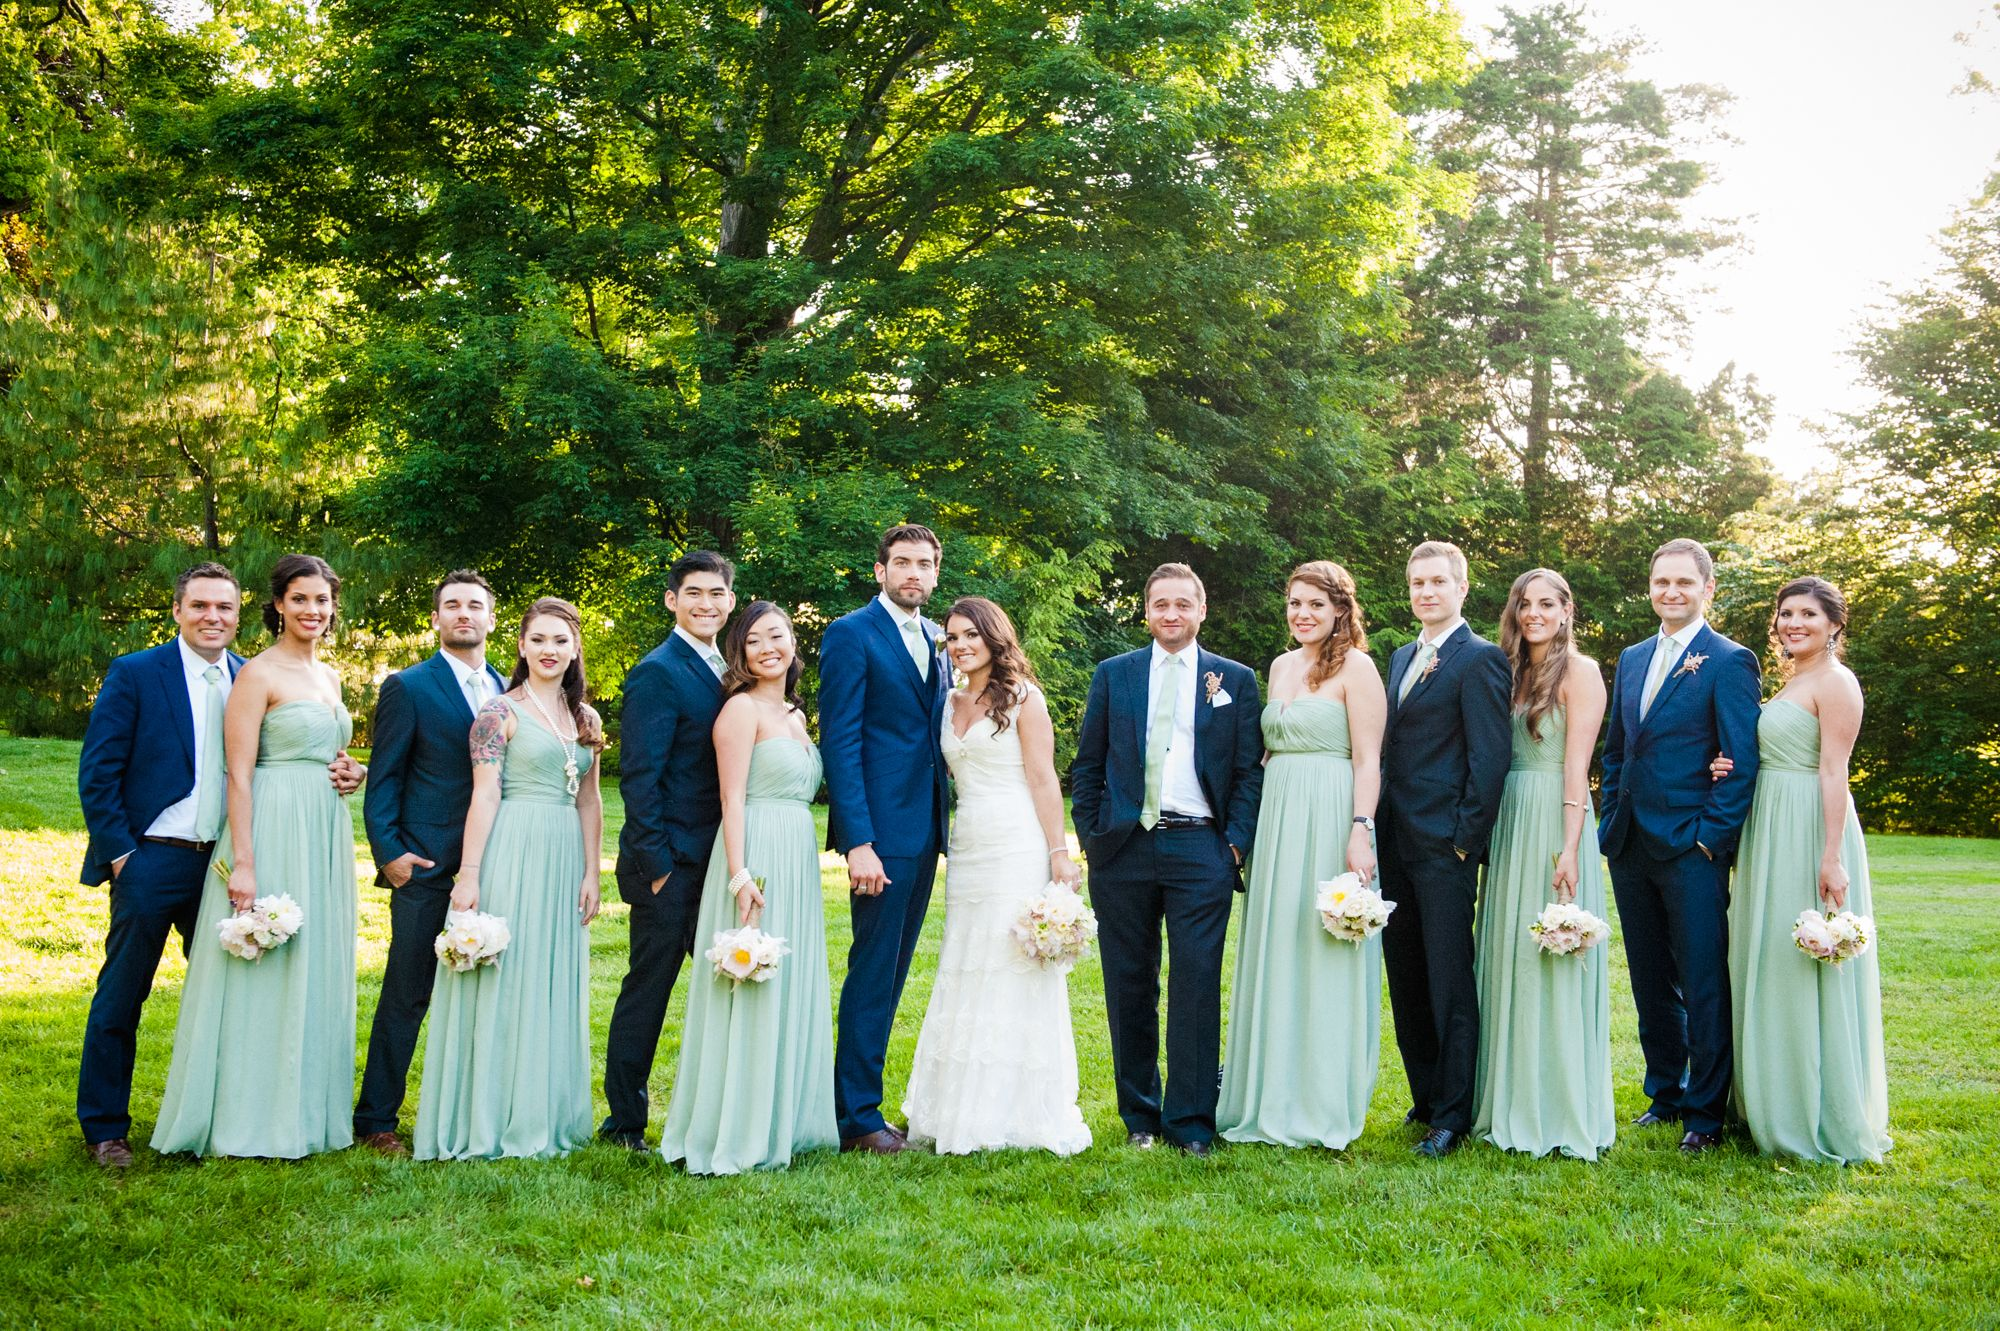 Navy and Mint Green Wedding Party  Wedding  Pinterest